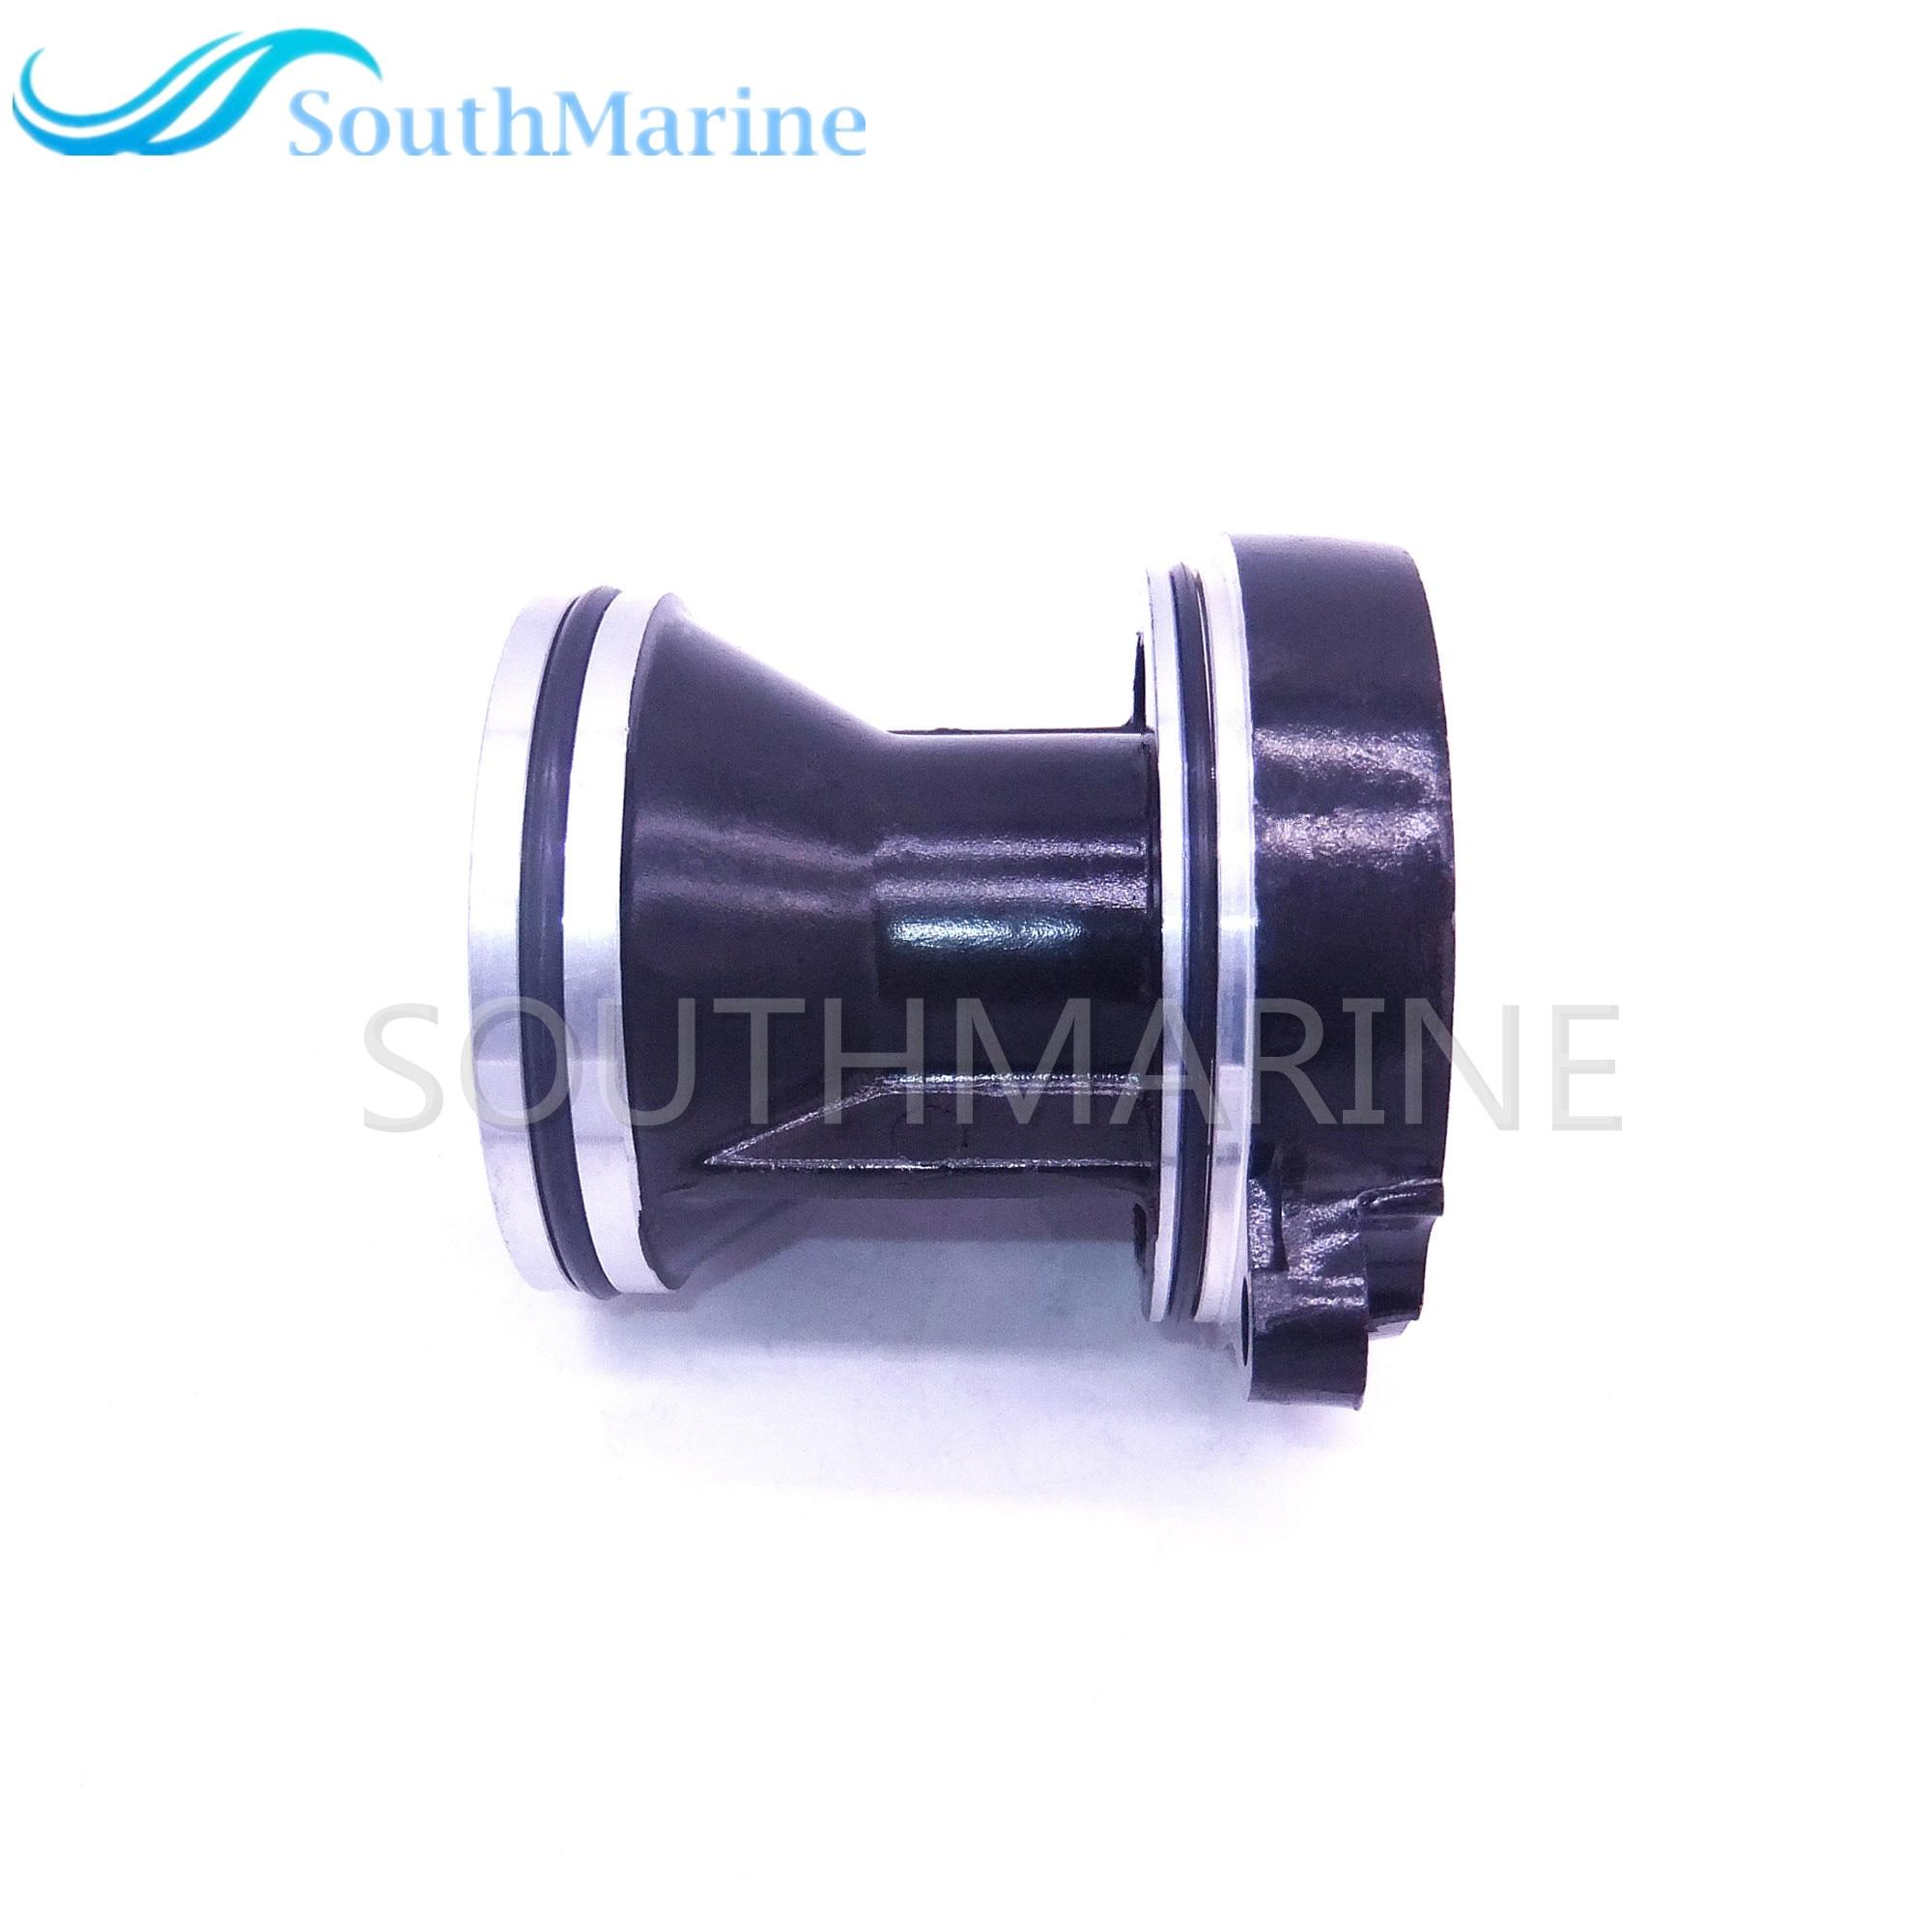 683-45361-02-8D 683-45361-01-4D 683-45361-02-4D, 683-45361-02-EK 683-45361 Lower Casing Cap Cover With Bearing For Yamaha